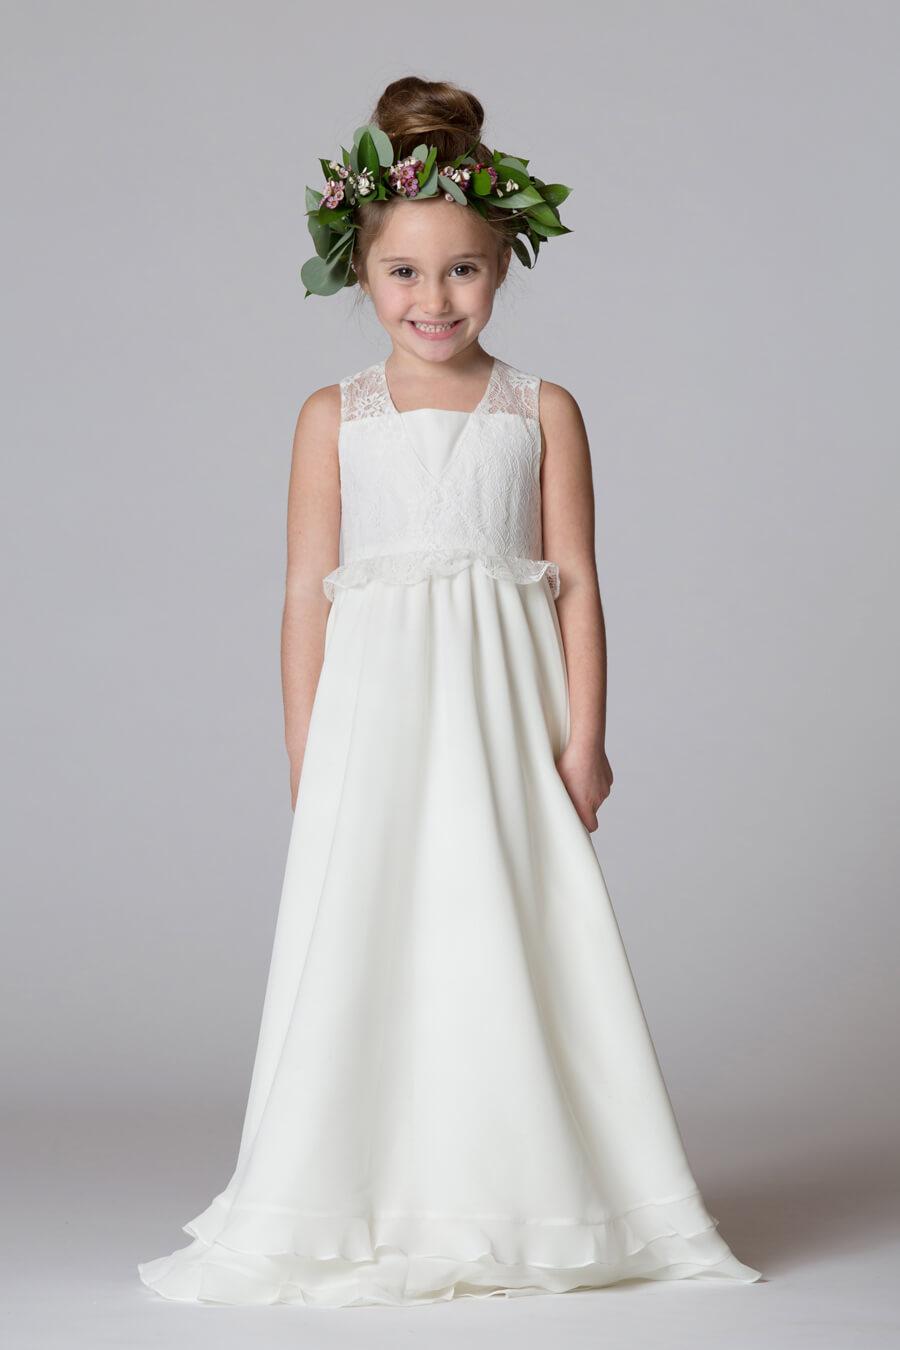 Bari jay bridesmaids bridesmaid dresses prom dresses formal select options ombrellifo Images